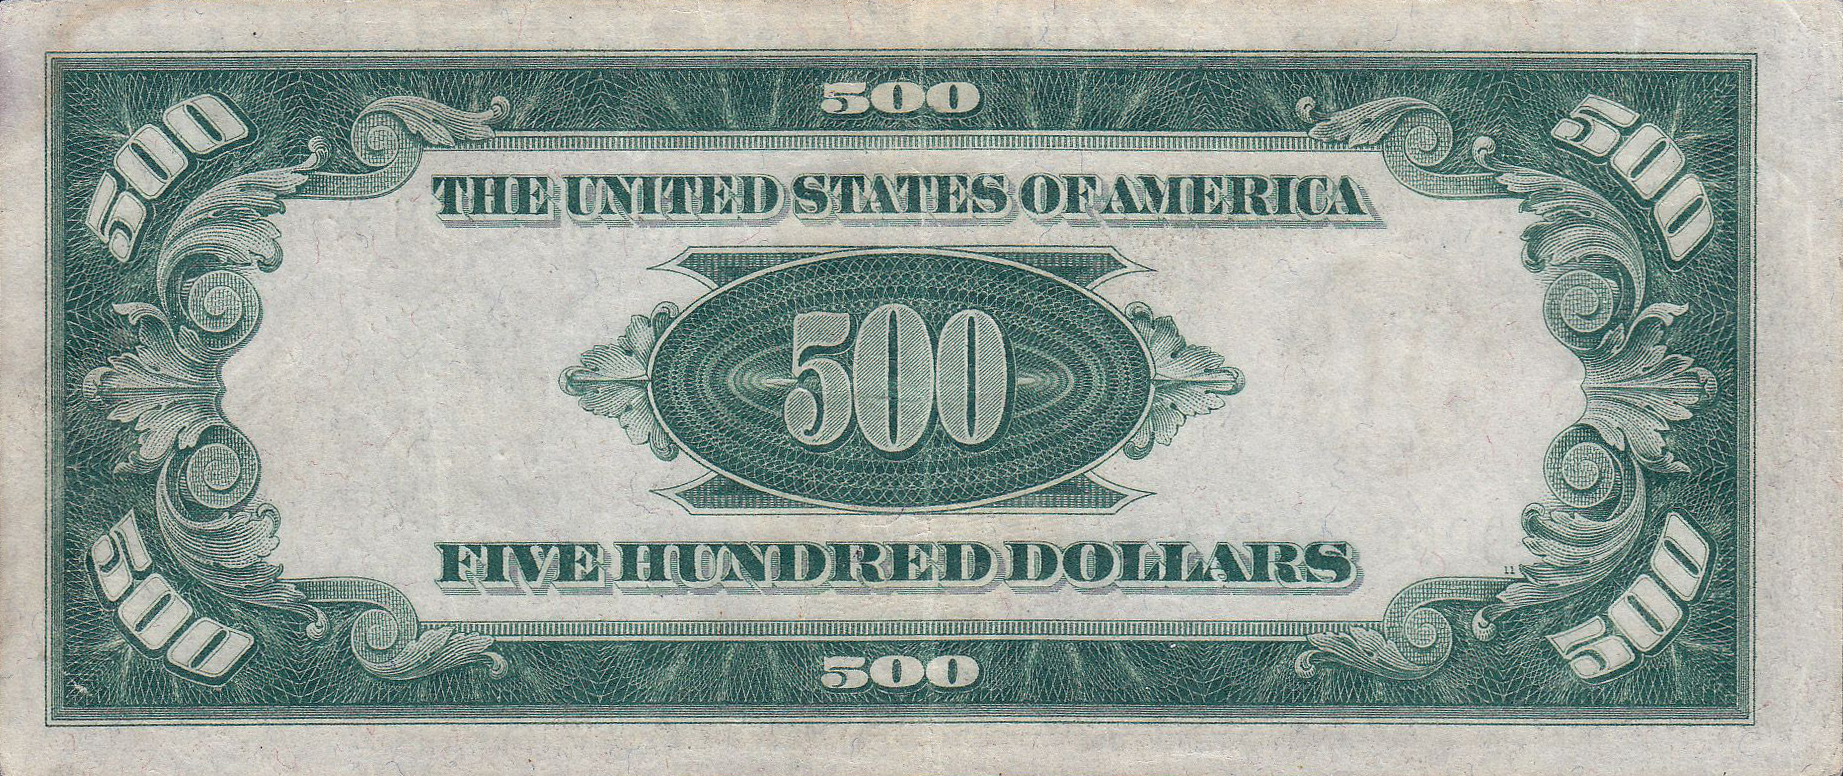 [Image: 500_USD_note%3B_series_of_1934%3B_reverse.jpg]